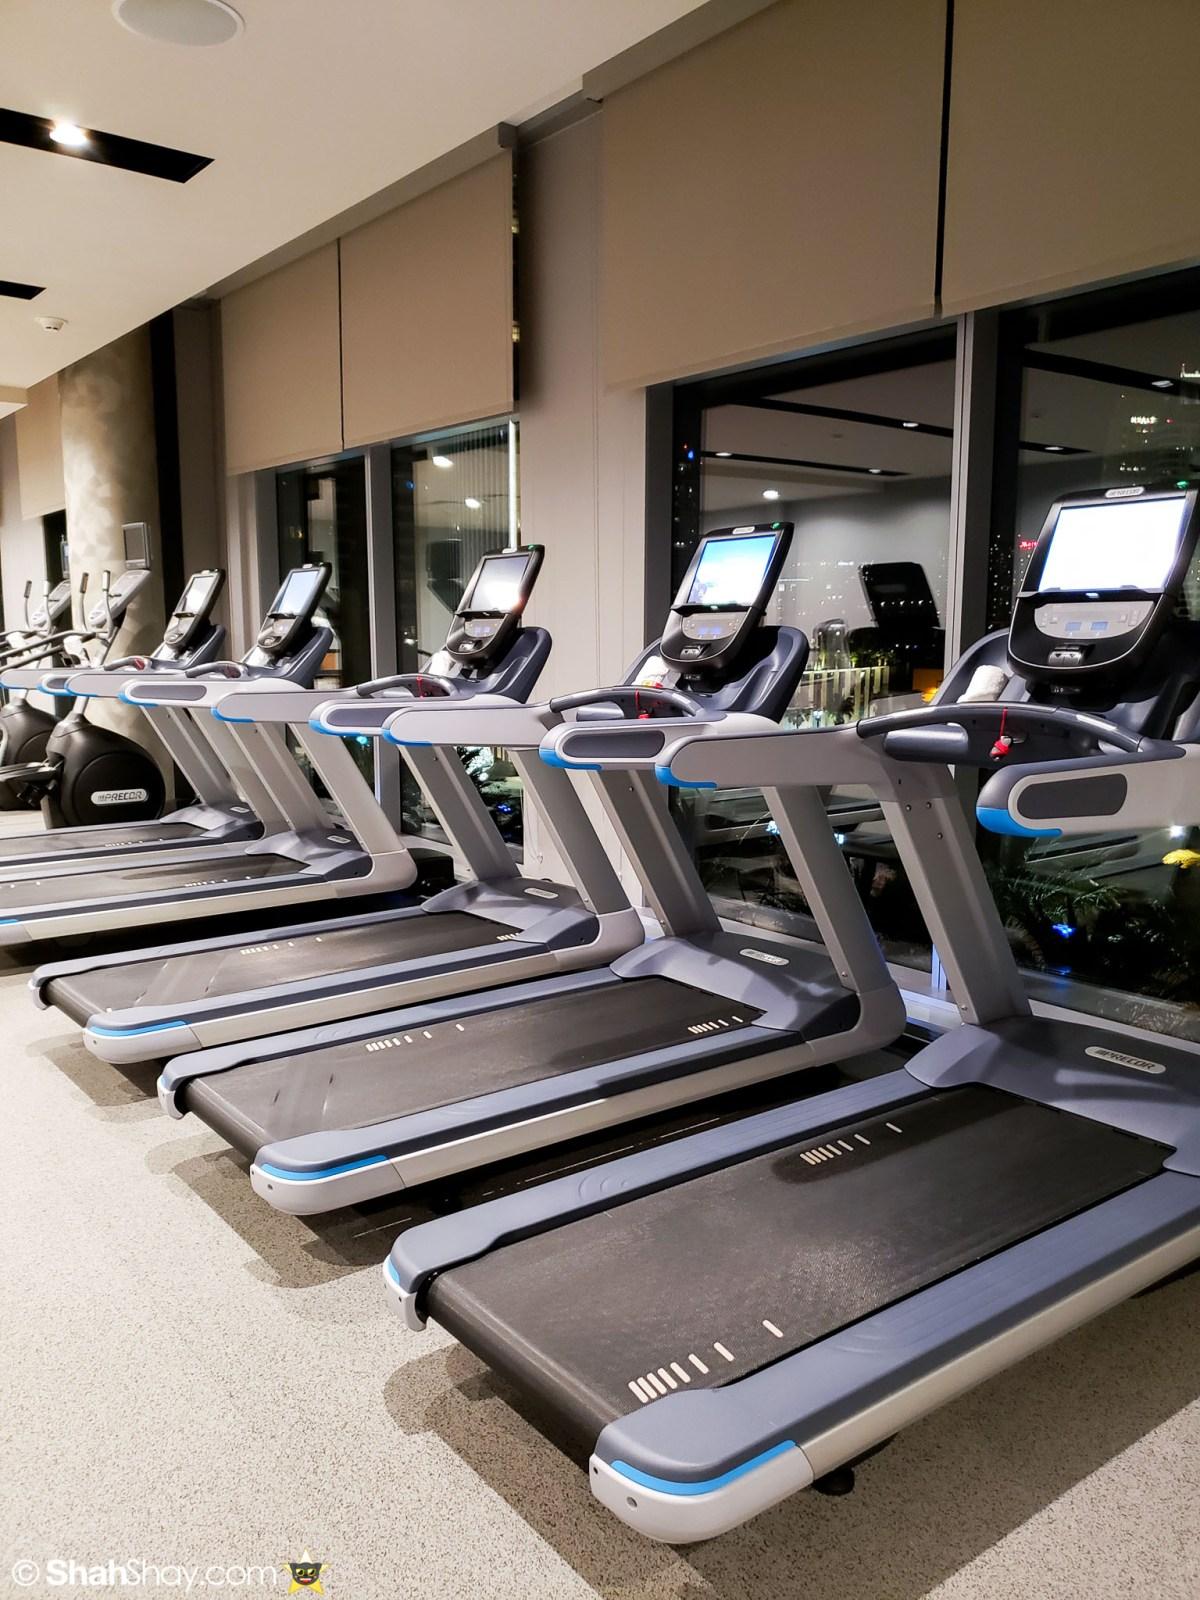 InterContinental San Diego Fitness Center - Treadmills